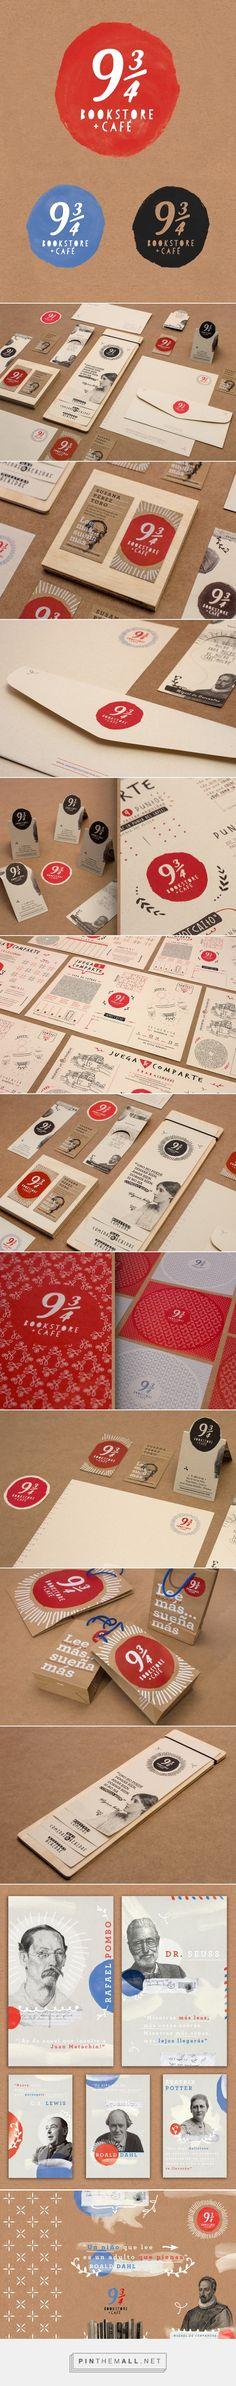 9 3/4 BOOKSTORE and CAFÉ Branding on Behance | Fivestar Branding – Design and Branding Agency & Inspiration Gallery